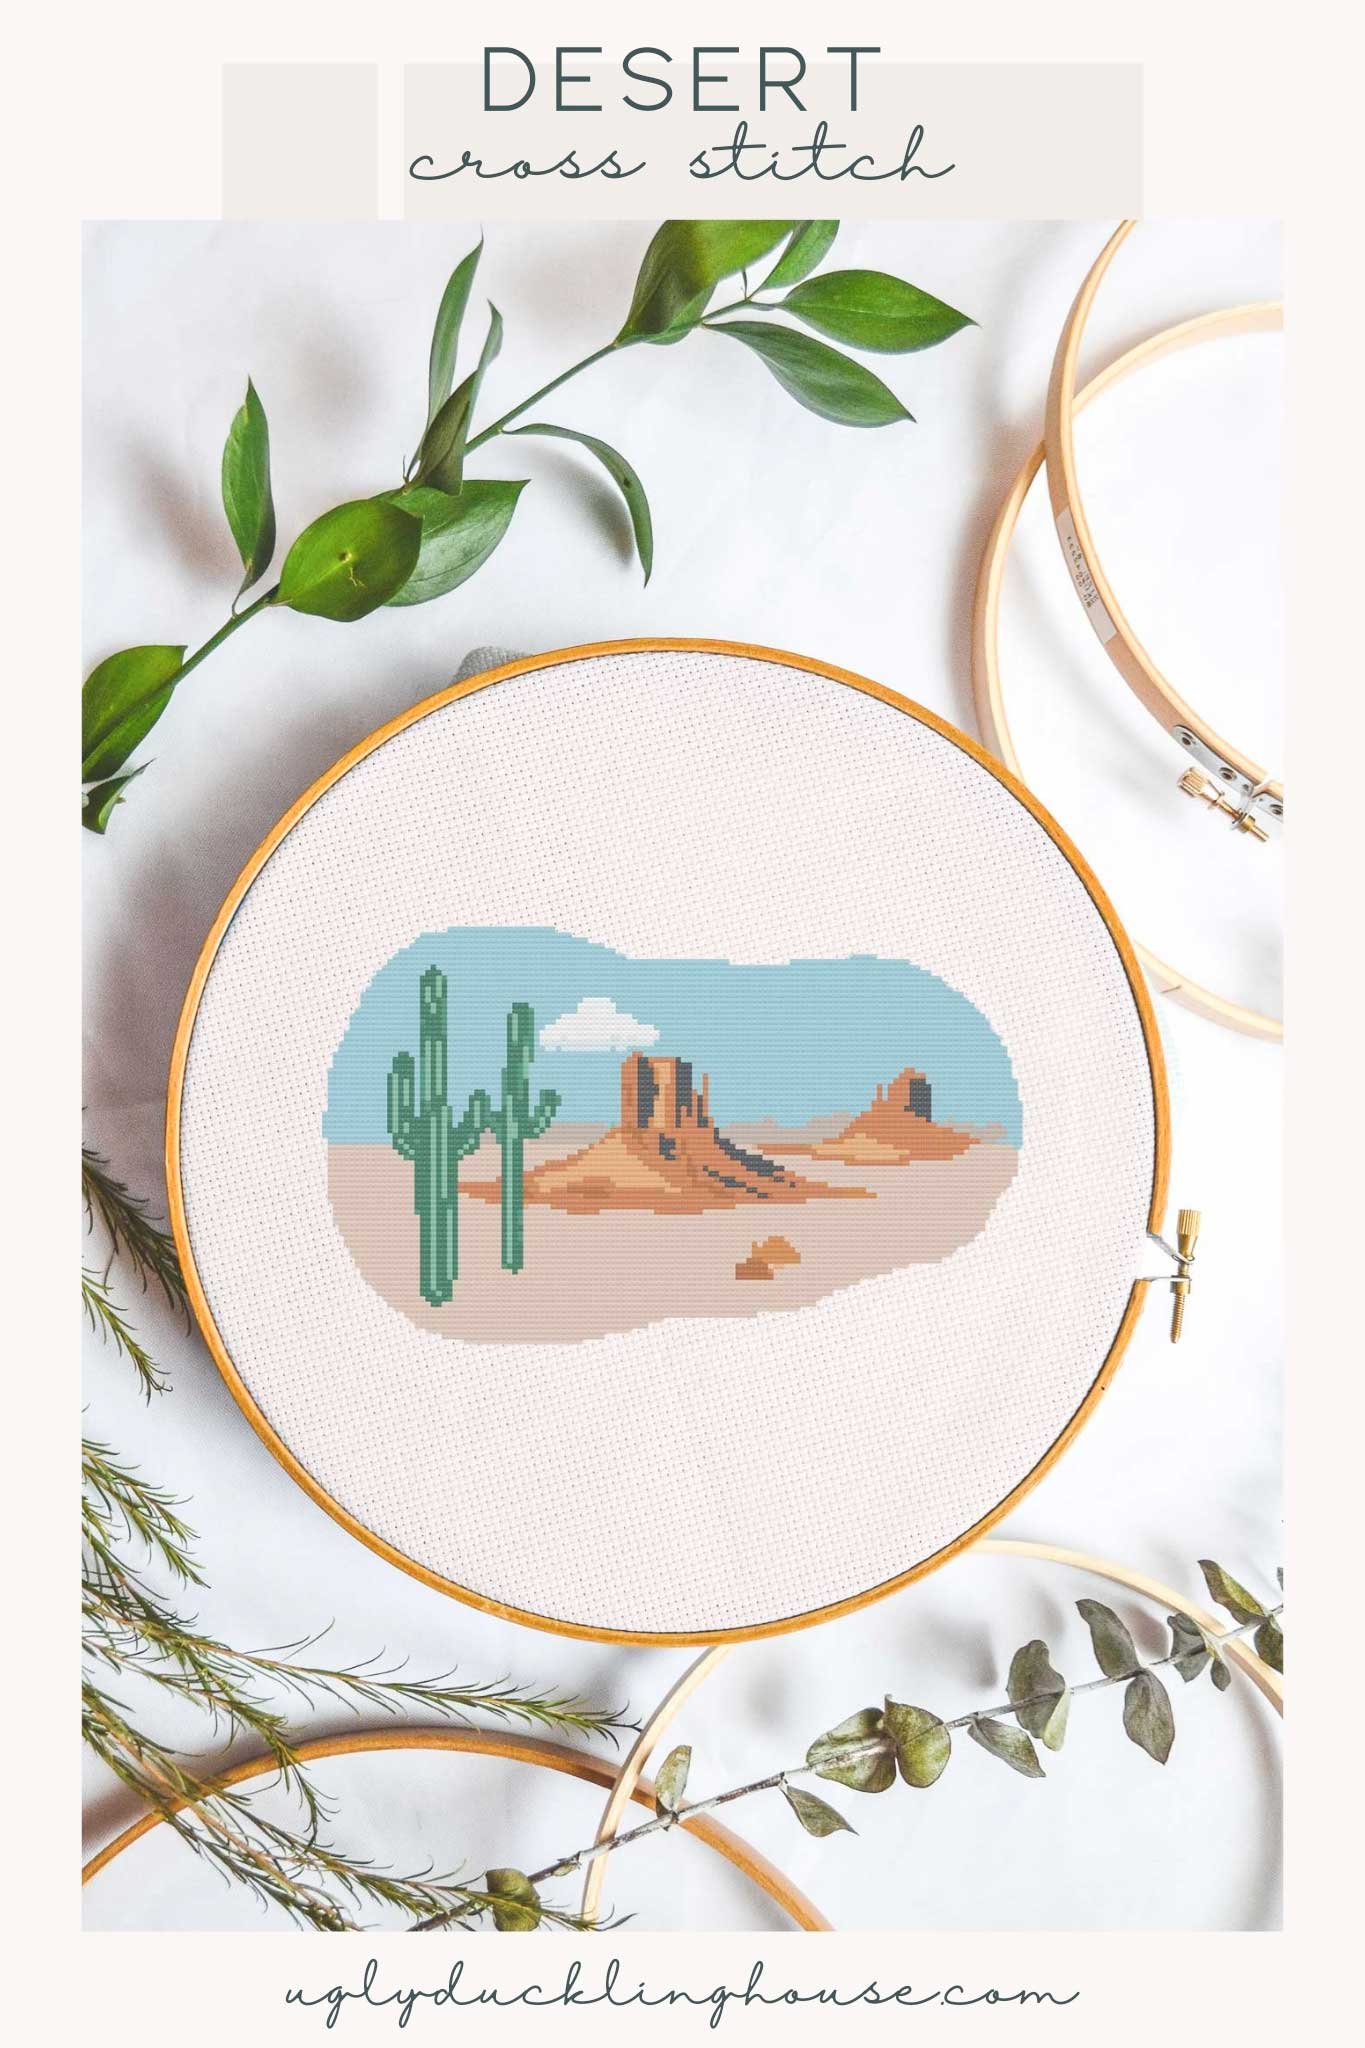 desert cross stitch pattern